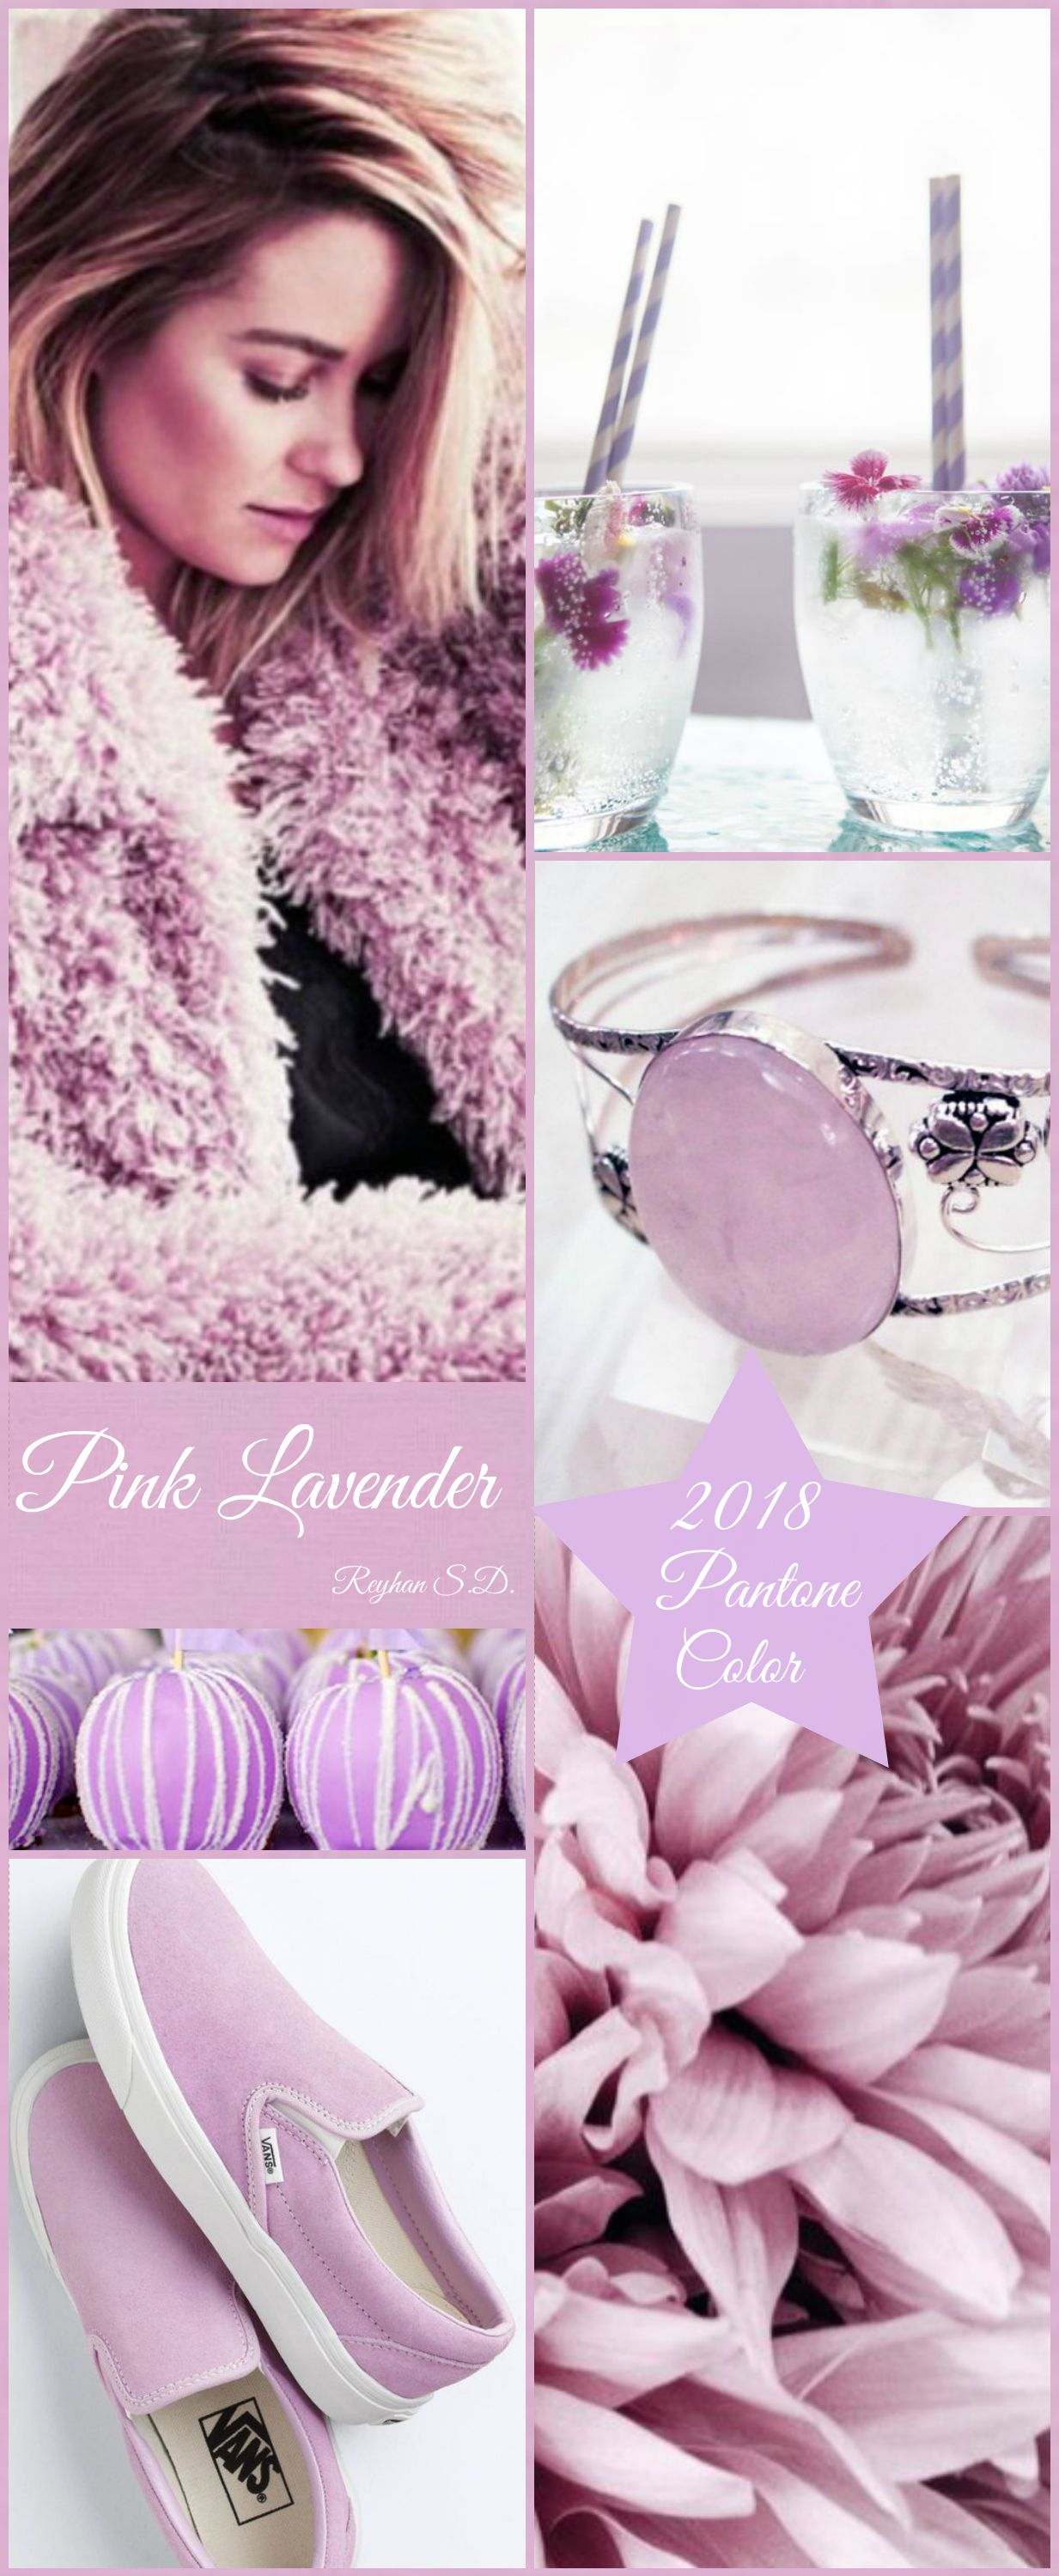 Color Trending Pink: '' Pink Lavender- 2018 Pantone Color '' By Reyhan S.D